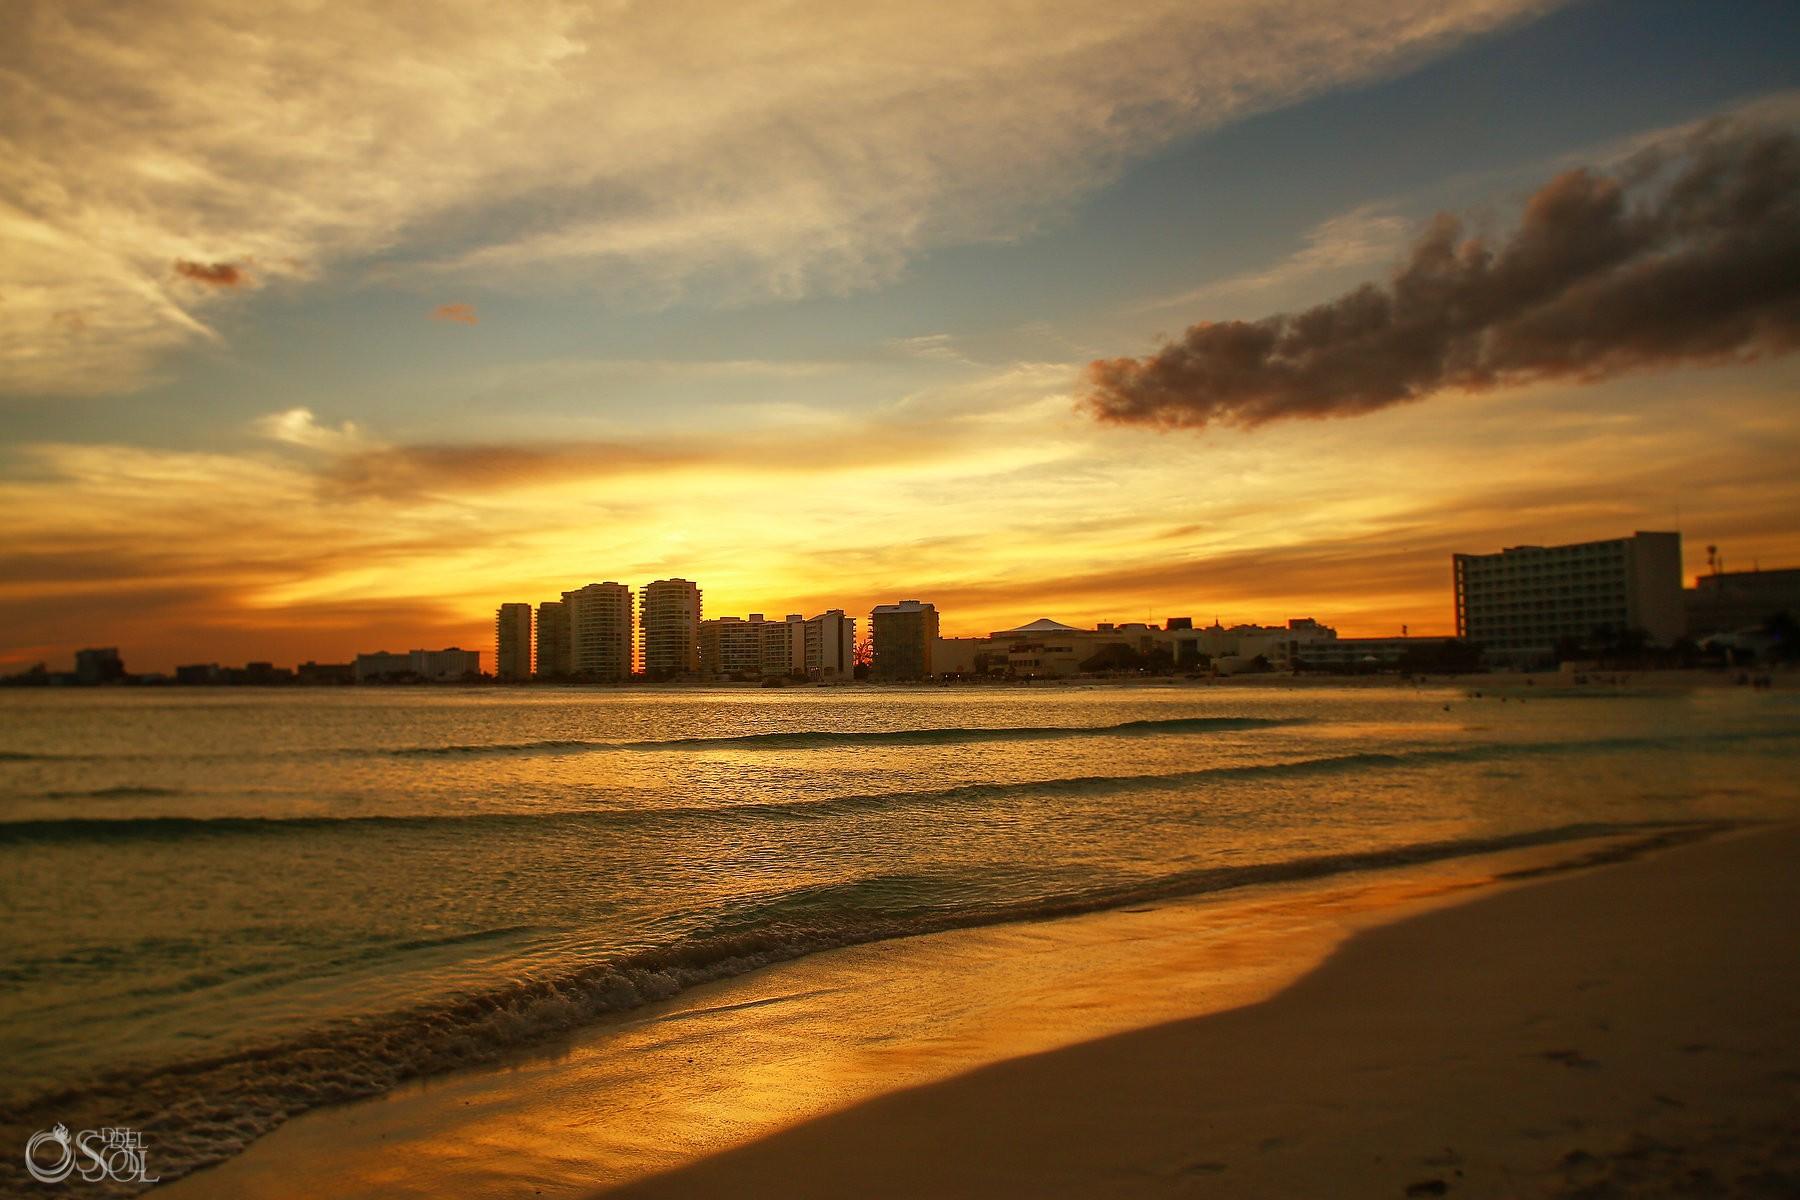 epic sunruse destination wedding venue Hyatt Ziva Cancun, Mexico by del sol photography